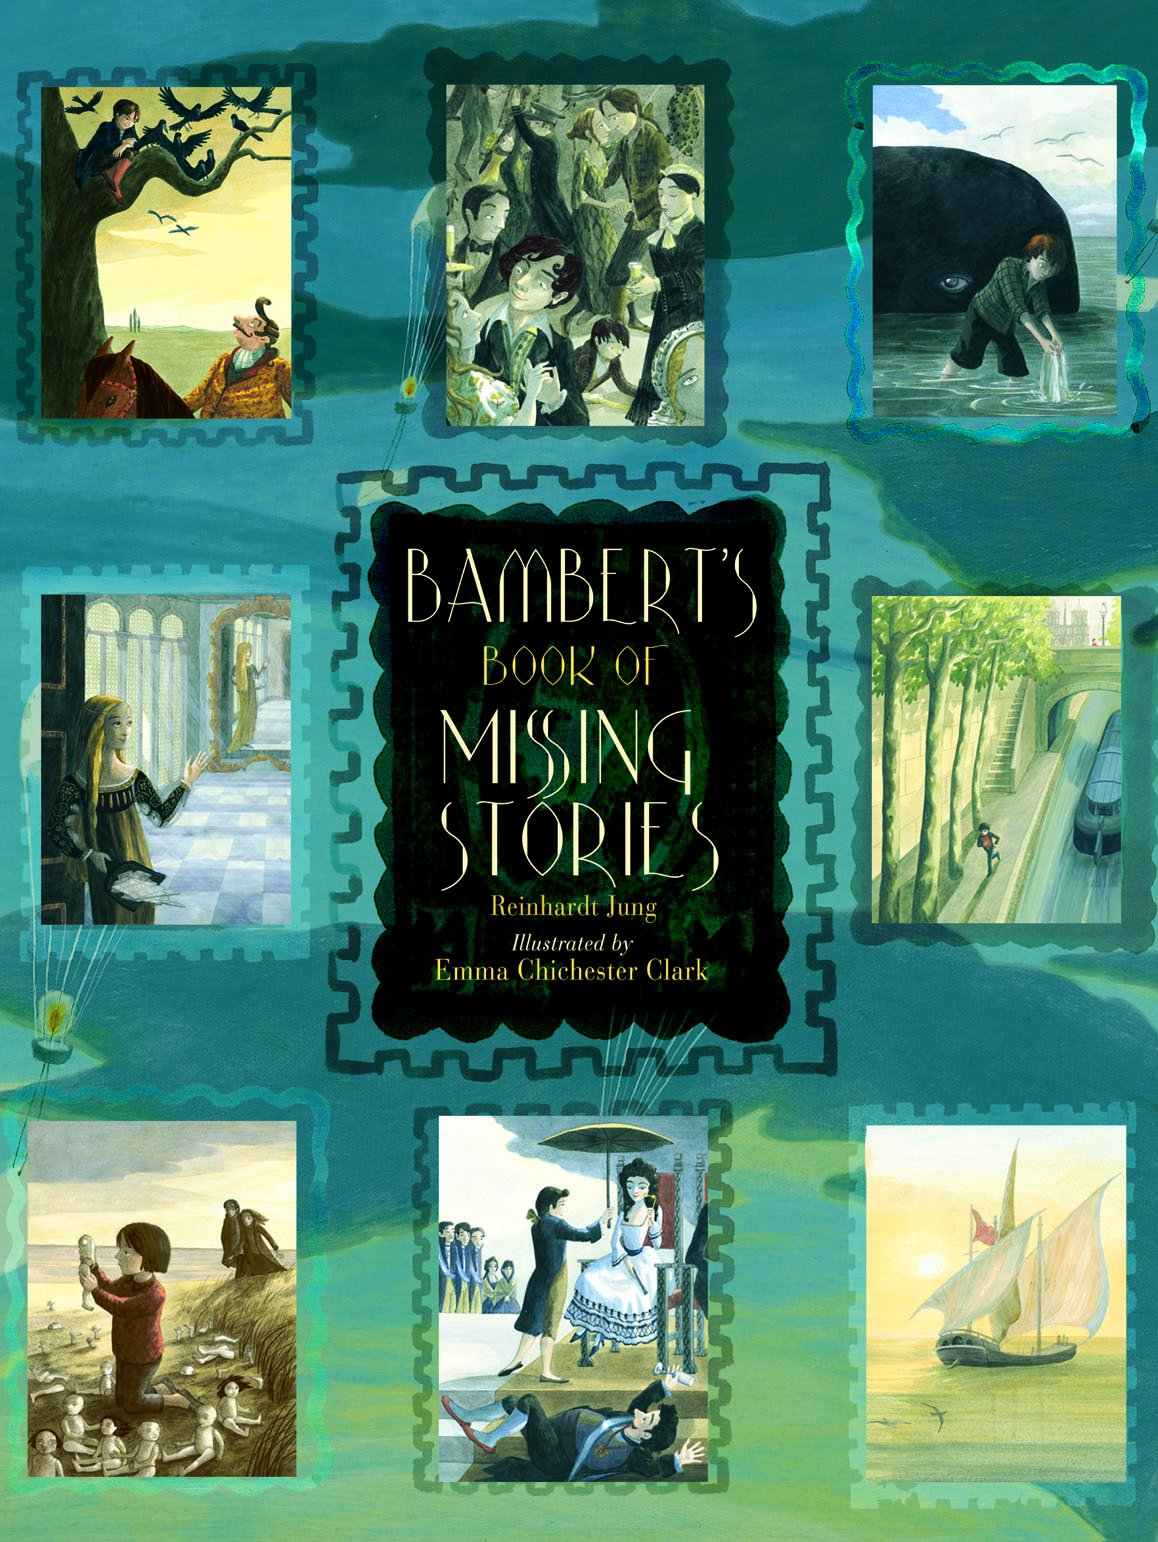 Bambert's Book of Missing Stories ebook